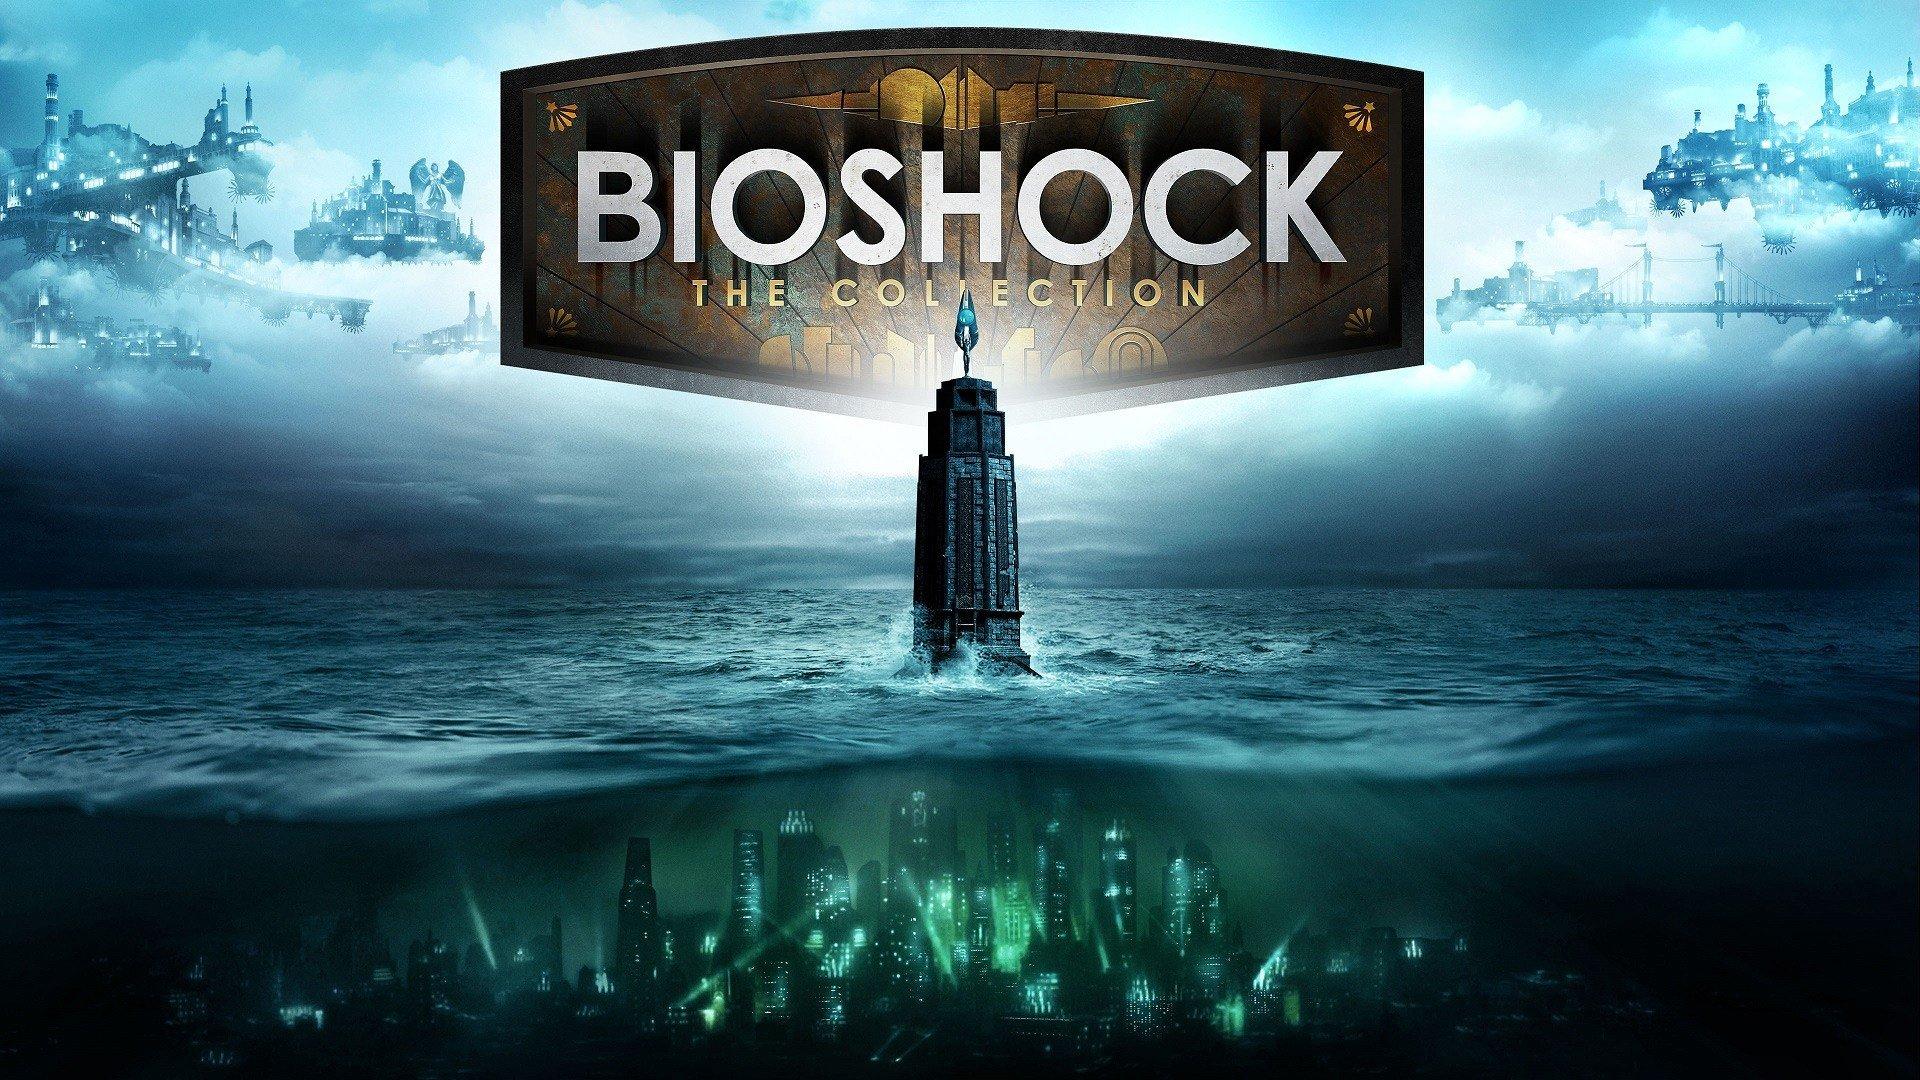 Bioshock refresh